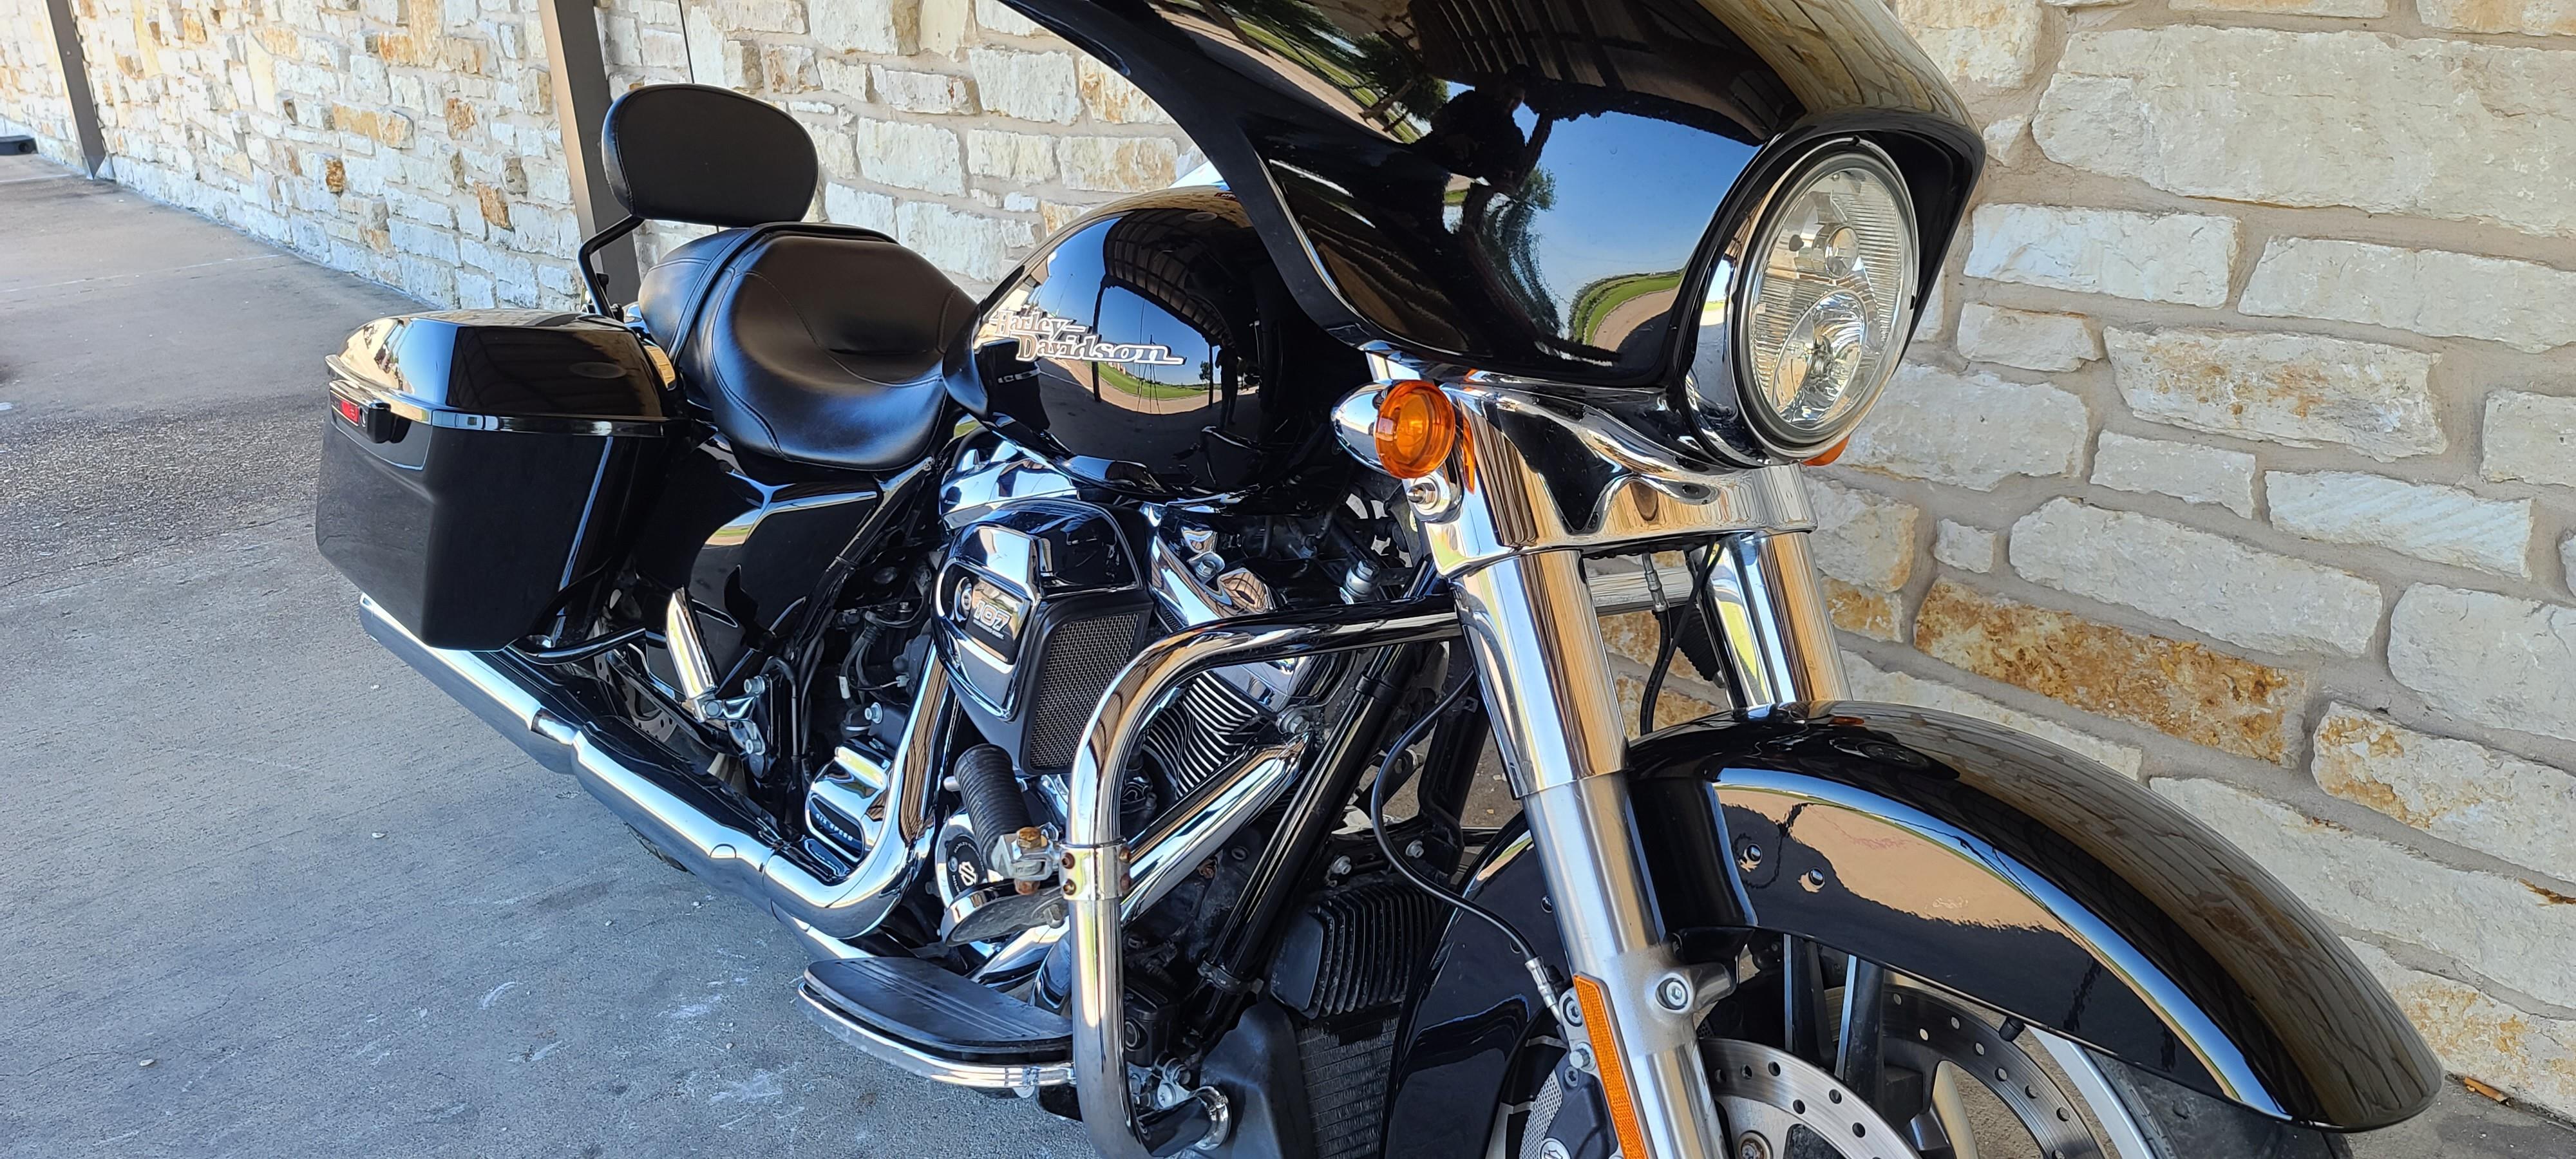 2019 Harley-Davidson Street Glide Base at Harley-Davidson of Waco